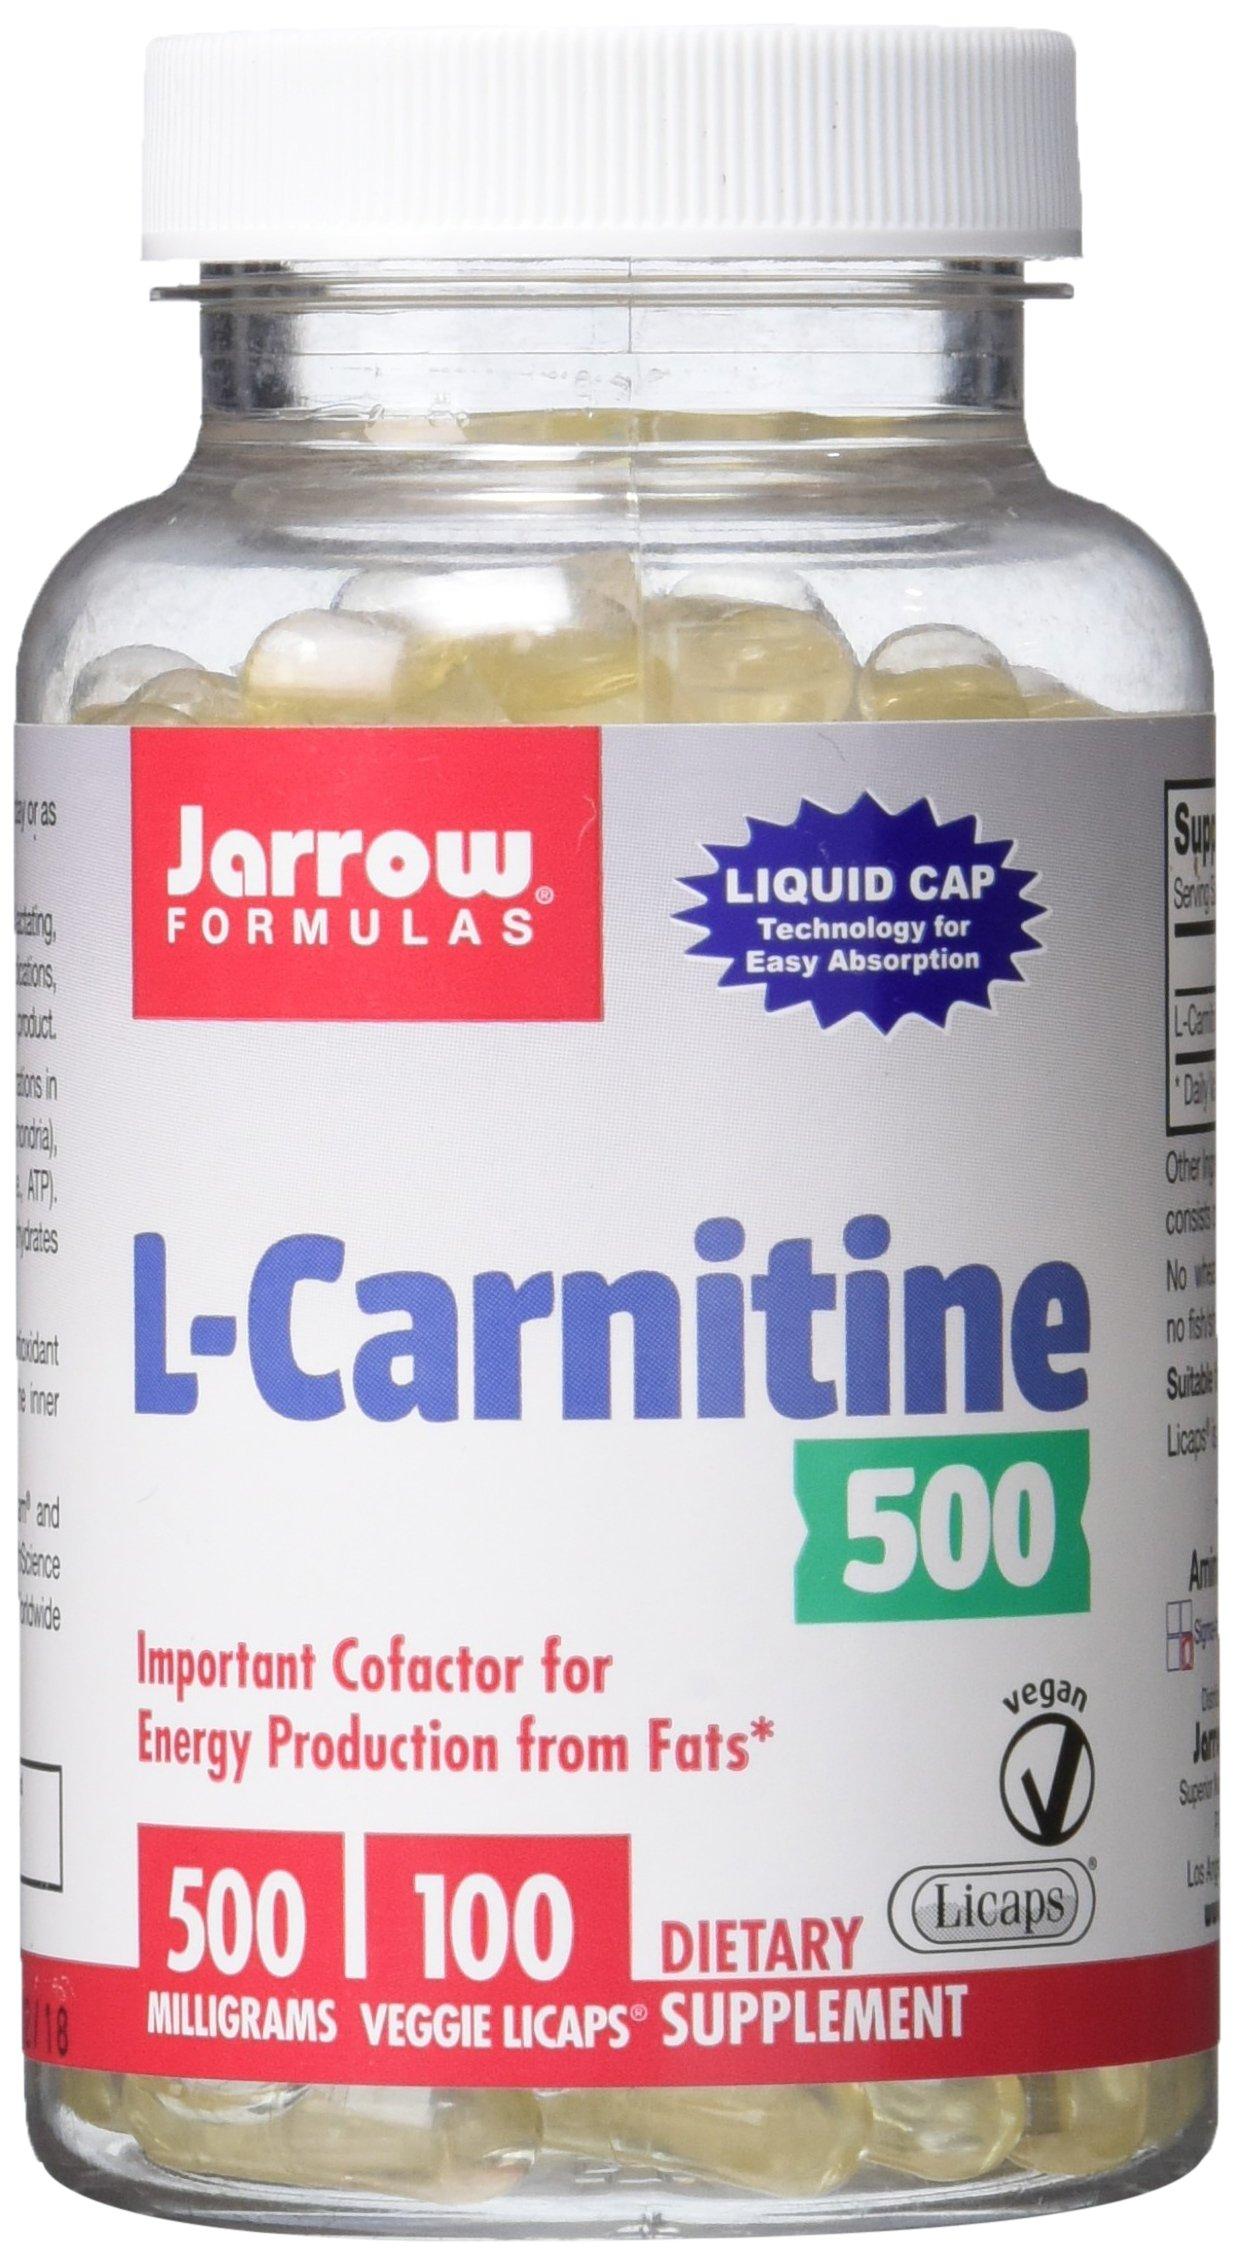 Jarrow Formulas L-Carnitine, Supports Enery, Cardiovascular Health, 500 mg, 100 Veggie Licaps